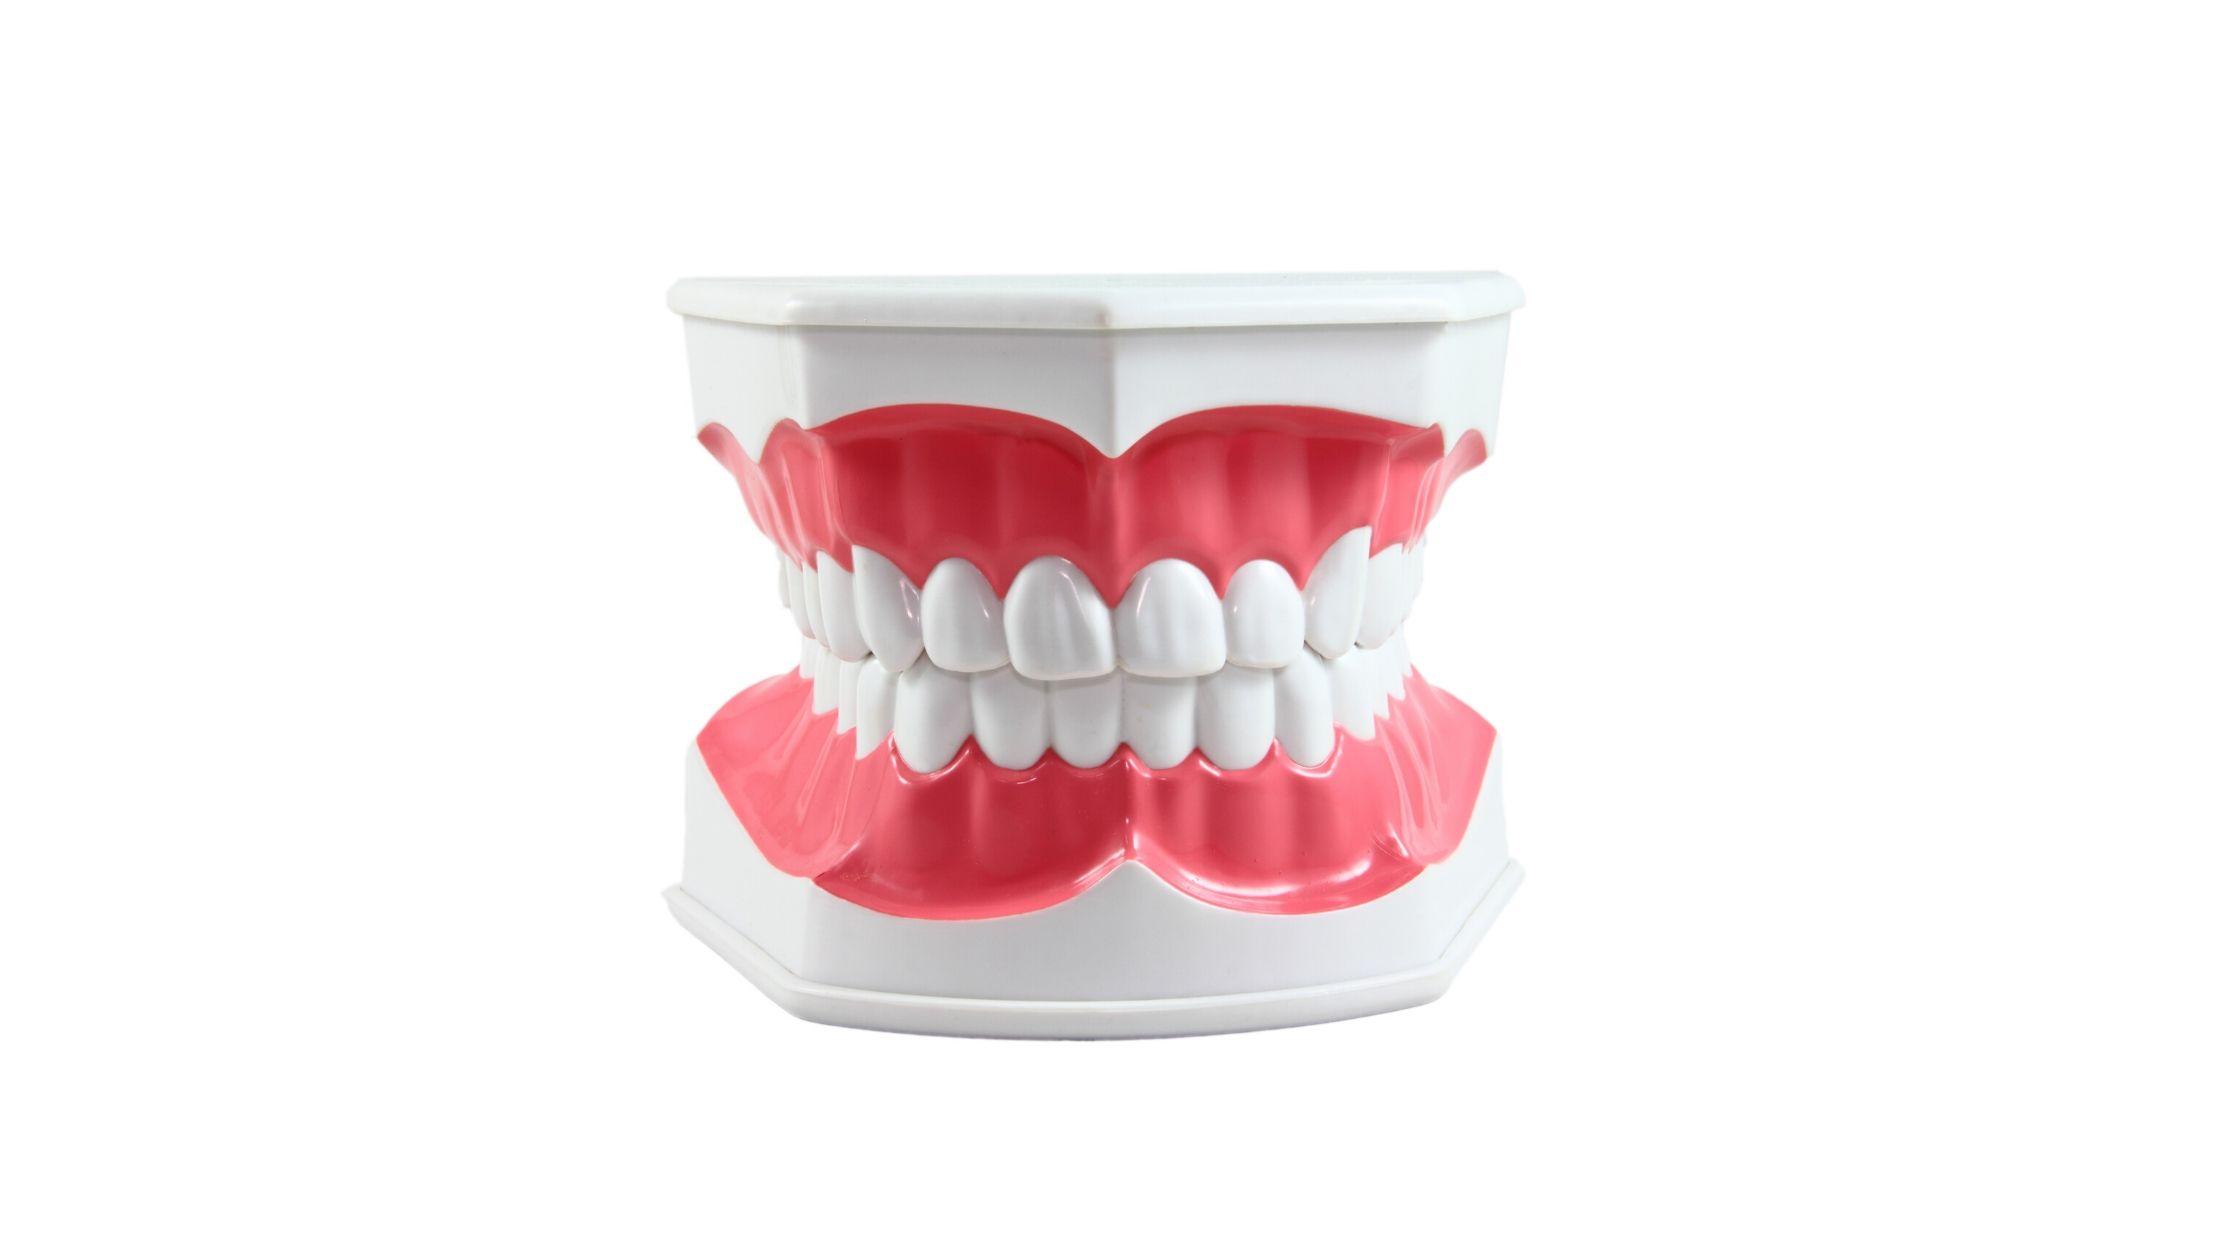 Treatment options of Gummy Smiles